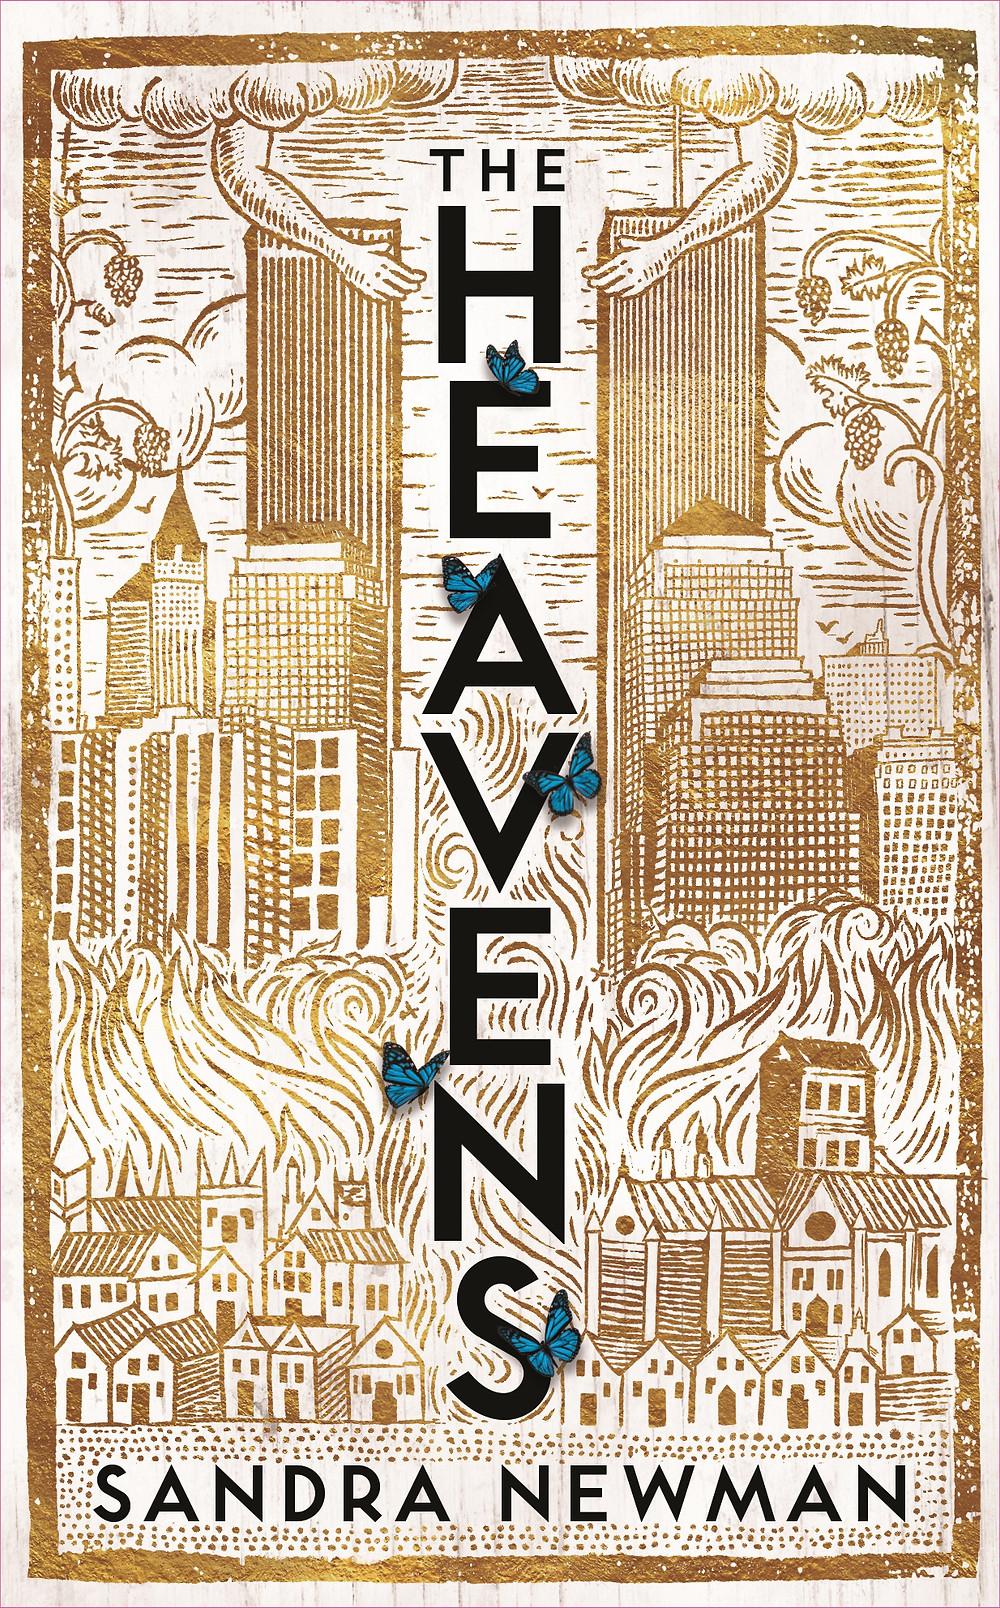 The Heavens By Sandra Newman 216 pages. 2019. The Book Slut book reviews, thebookslut. thebookslut.com